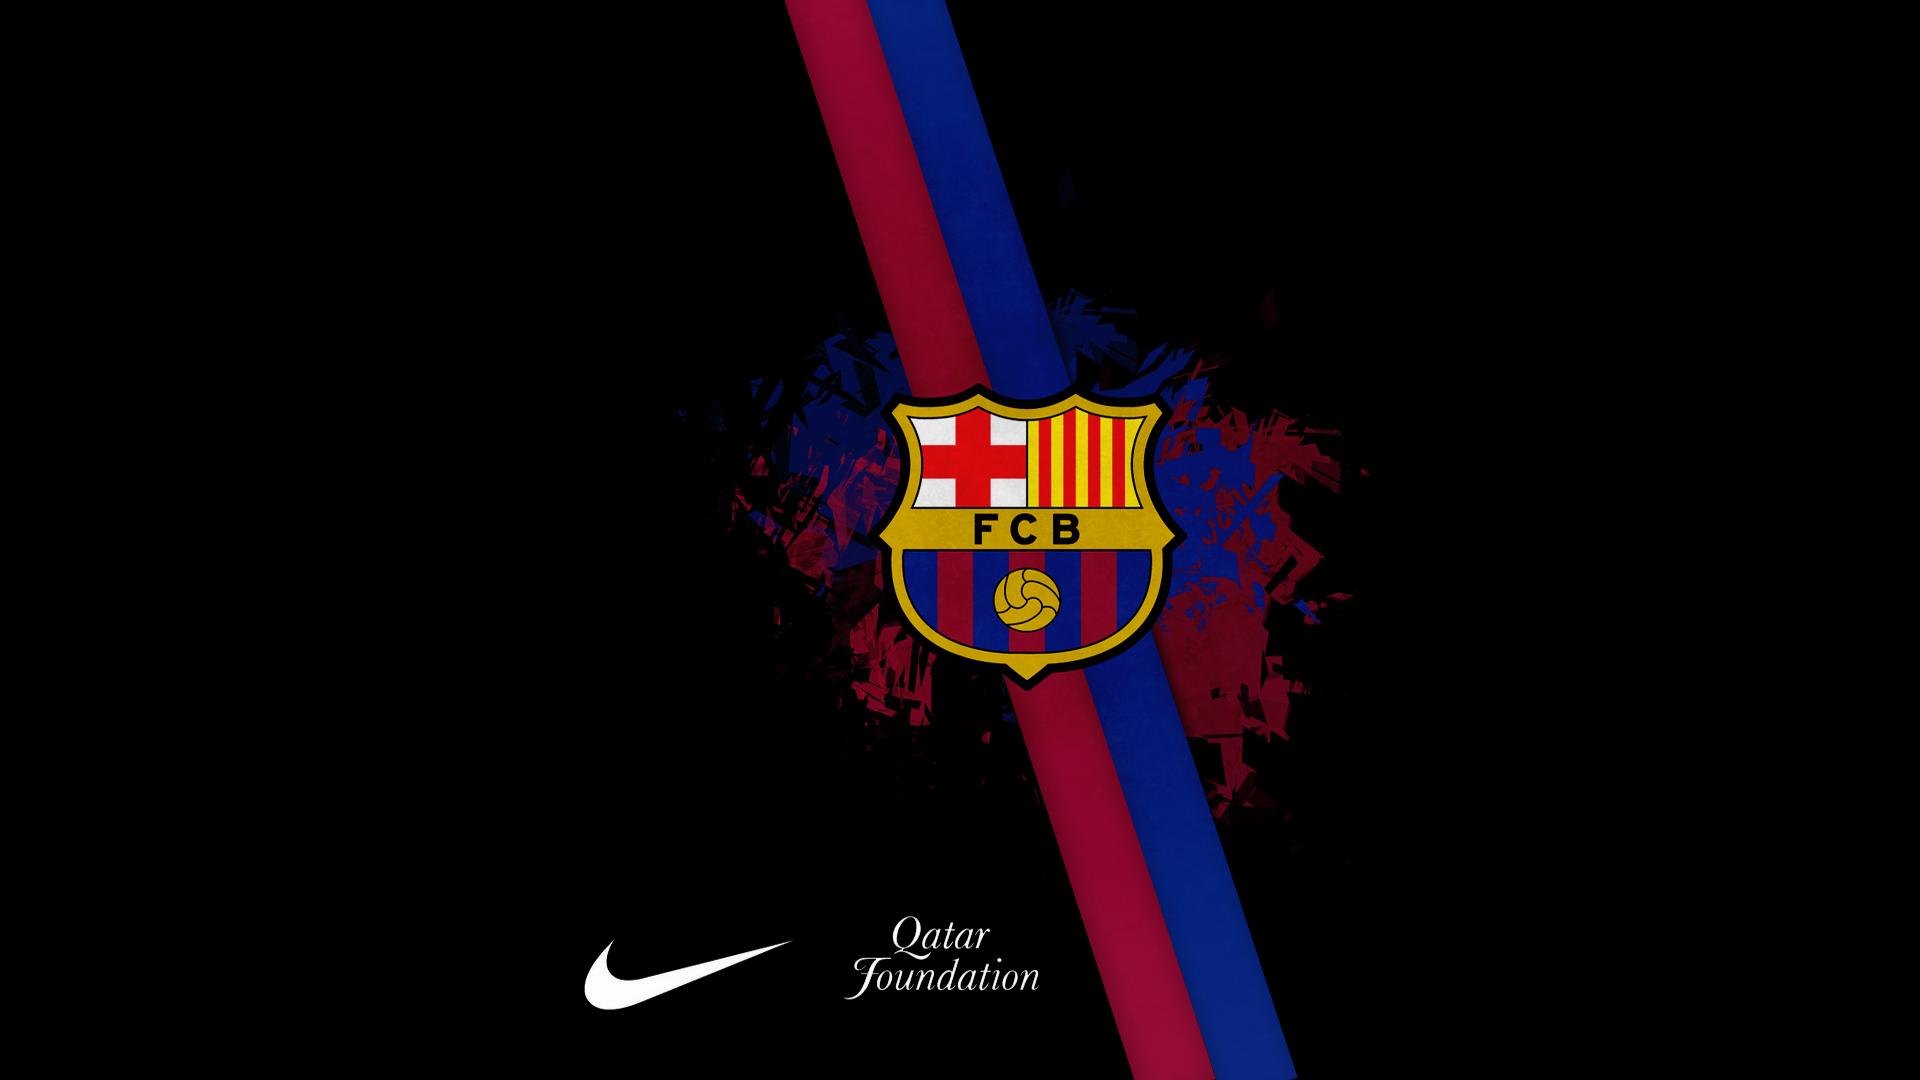 16 <b>FC Barcelona HD Wallpapers</b> | Backgrounds - <b>Wallpaper</b> Abyss